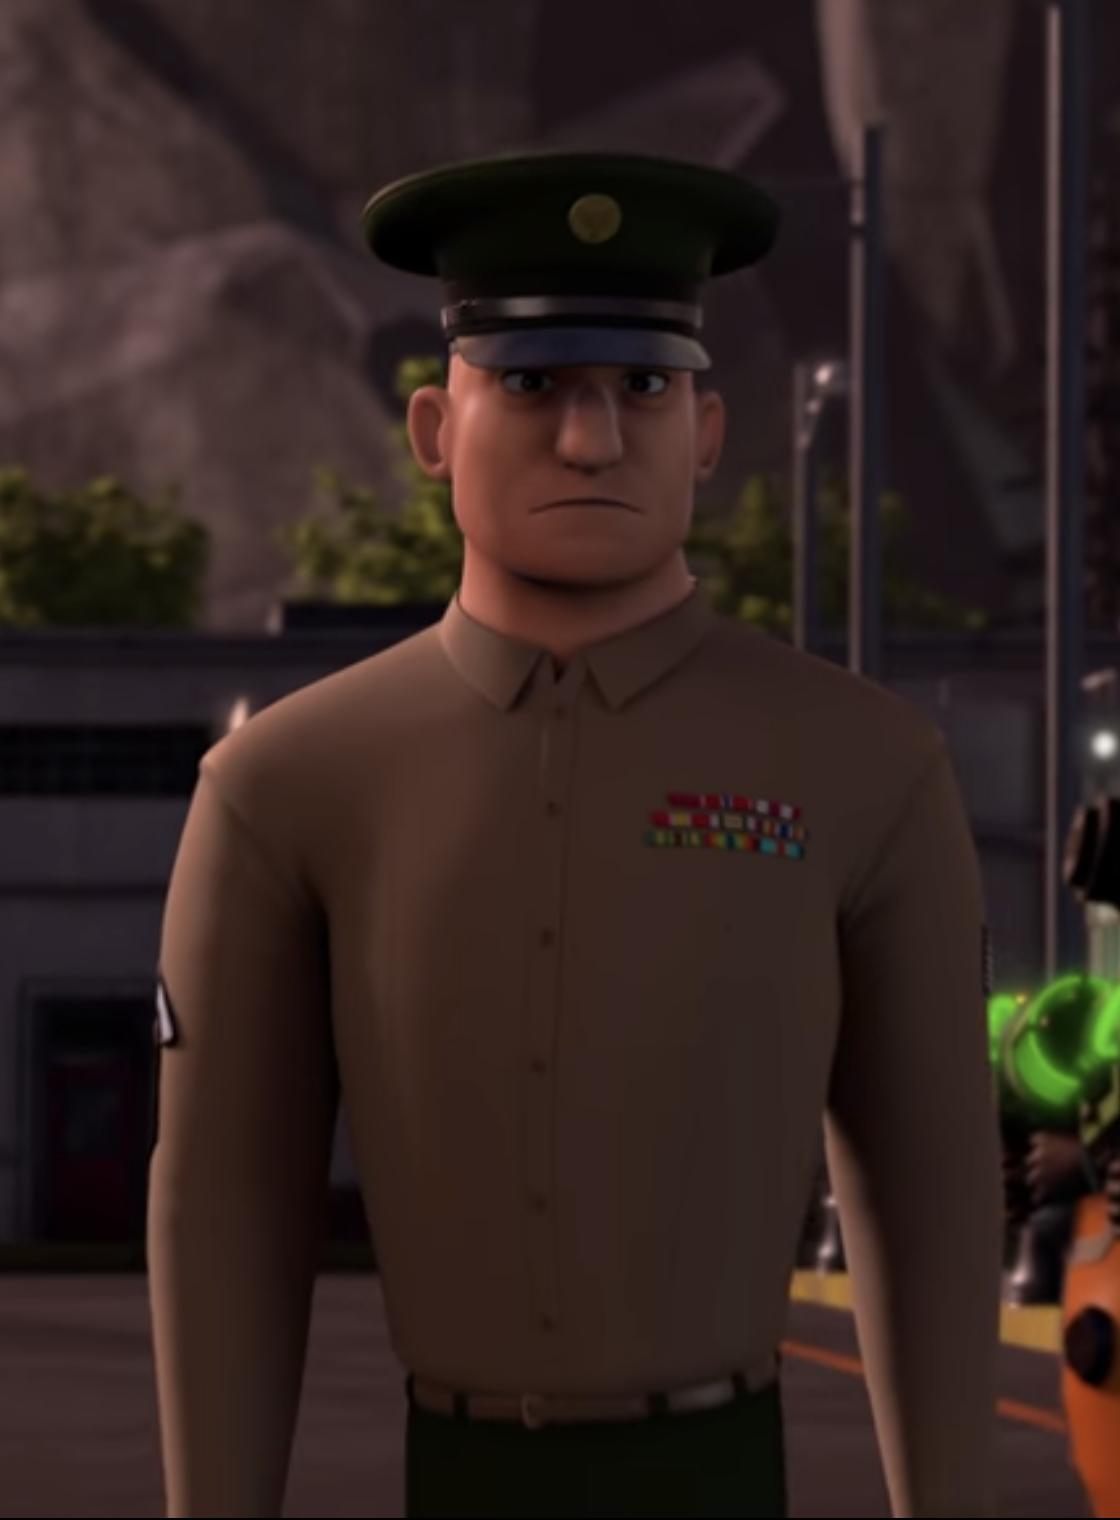 Sergeant Costas